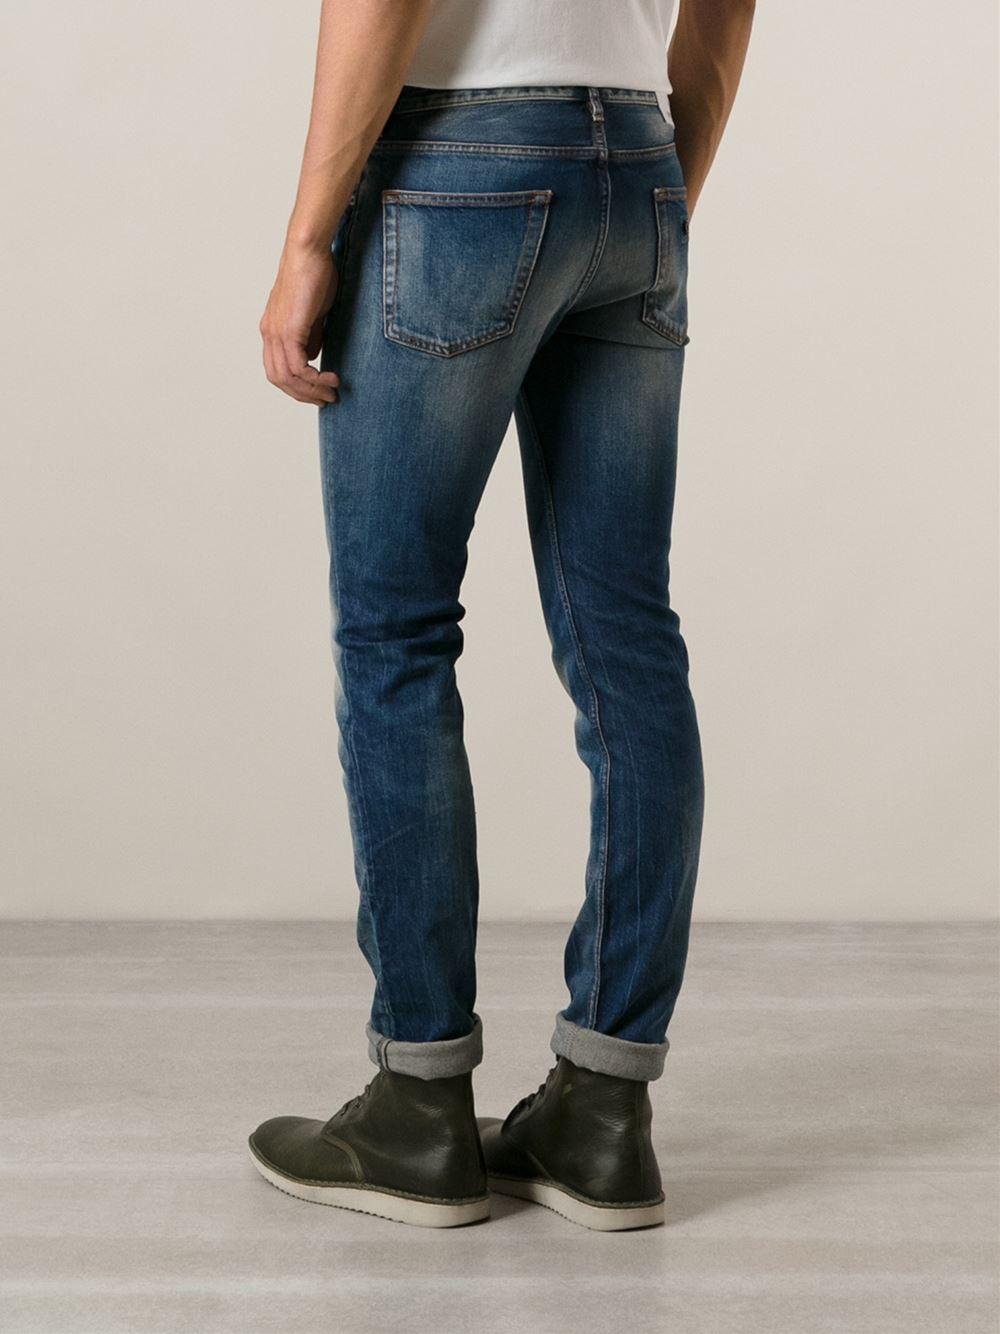 421e3bd6fb Stone Island Blue Skinny Jeans for men